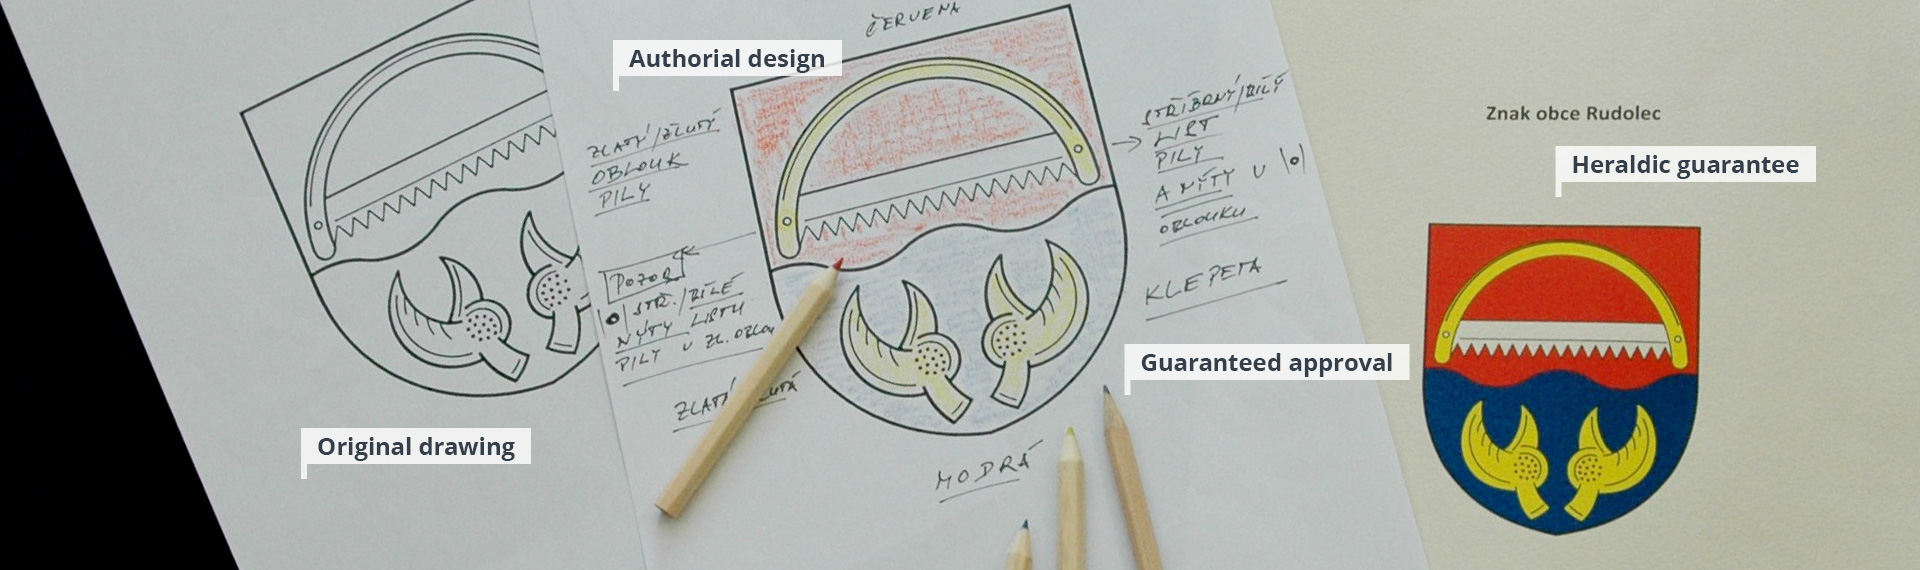 Municipal heraldry designs